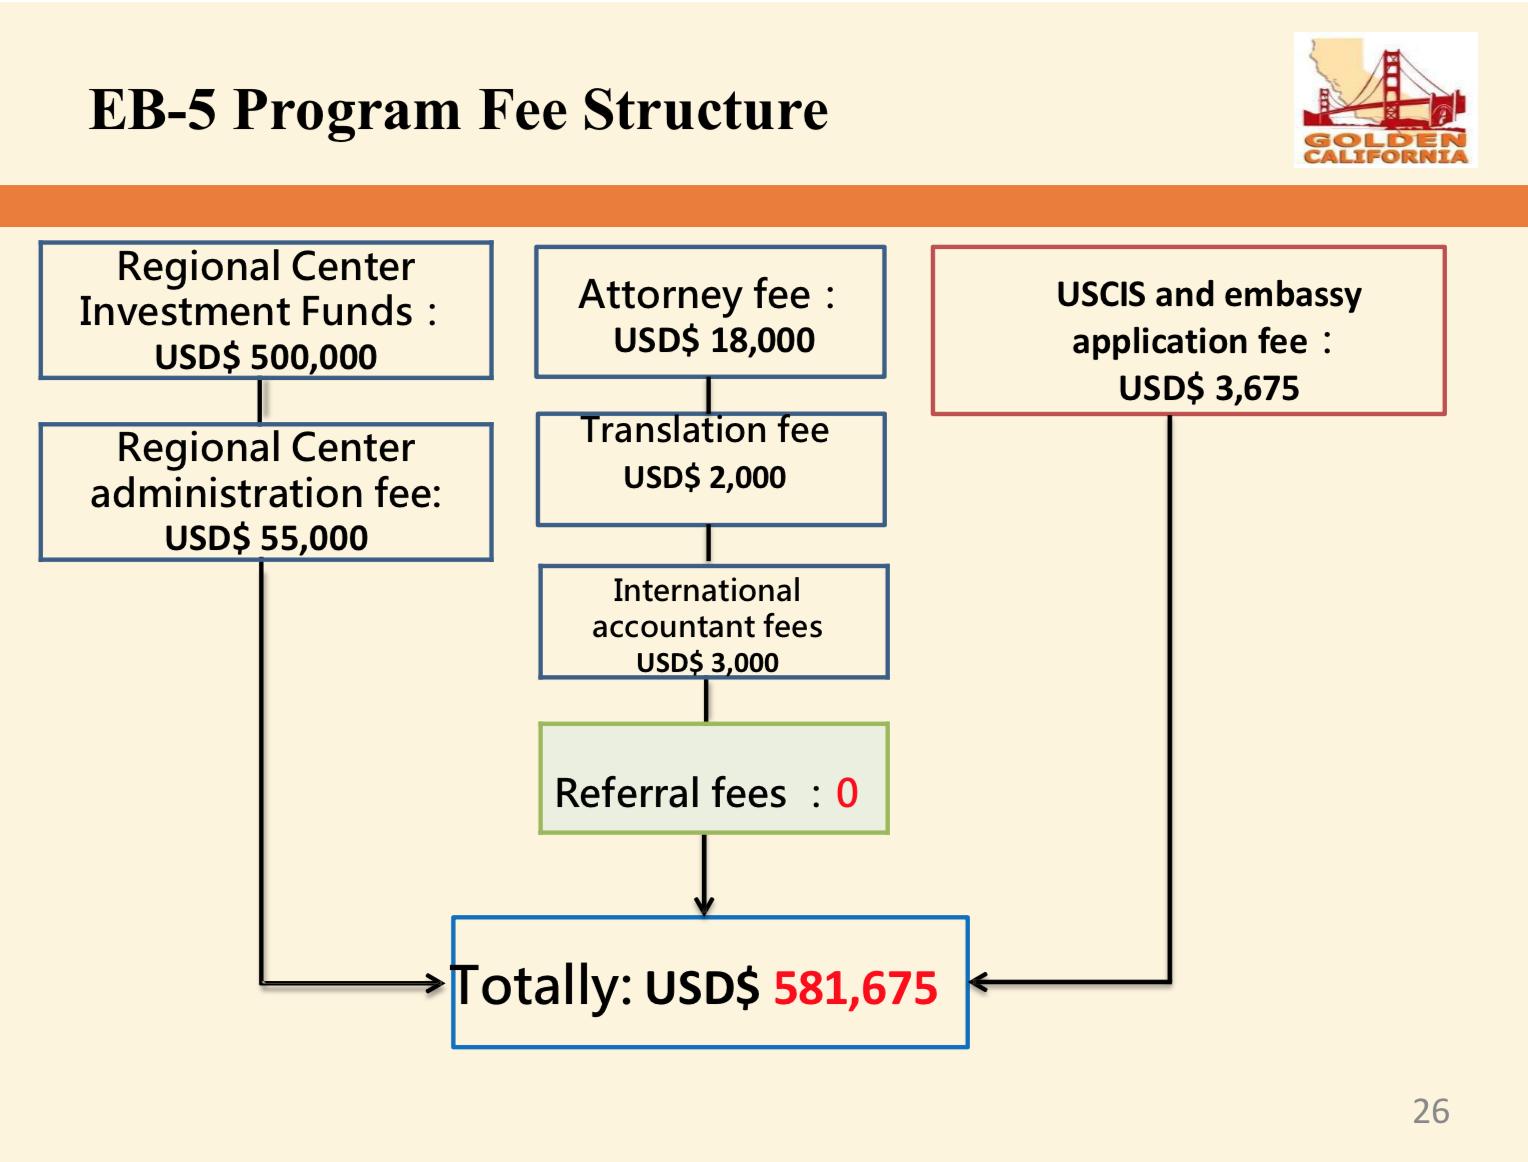 EB5-Program fee structure